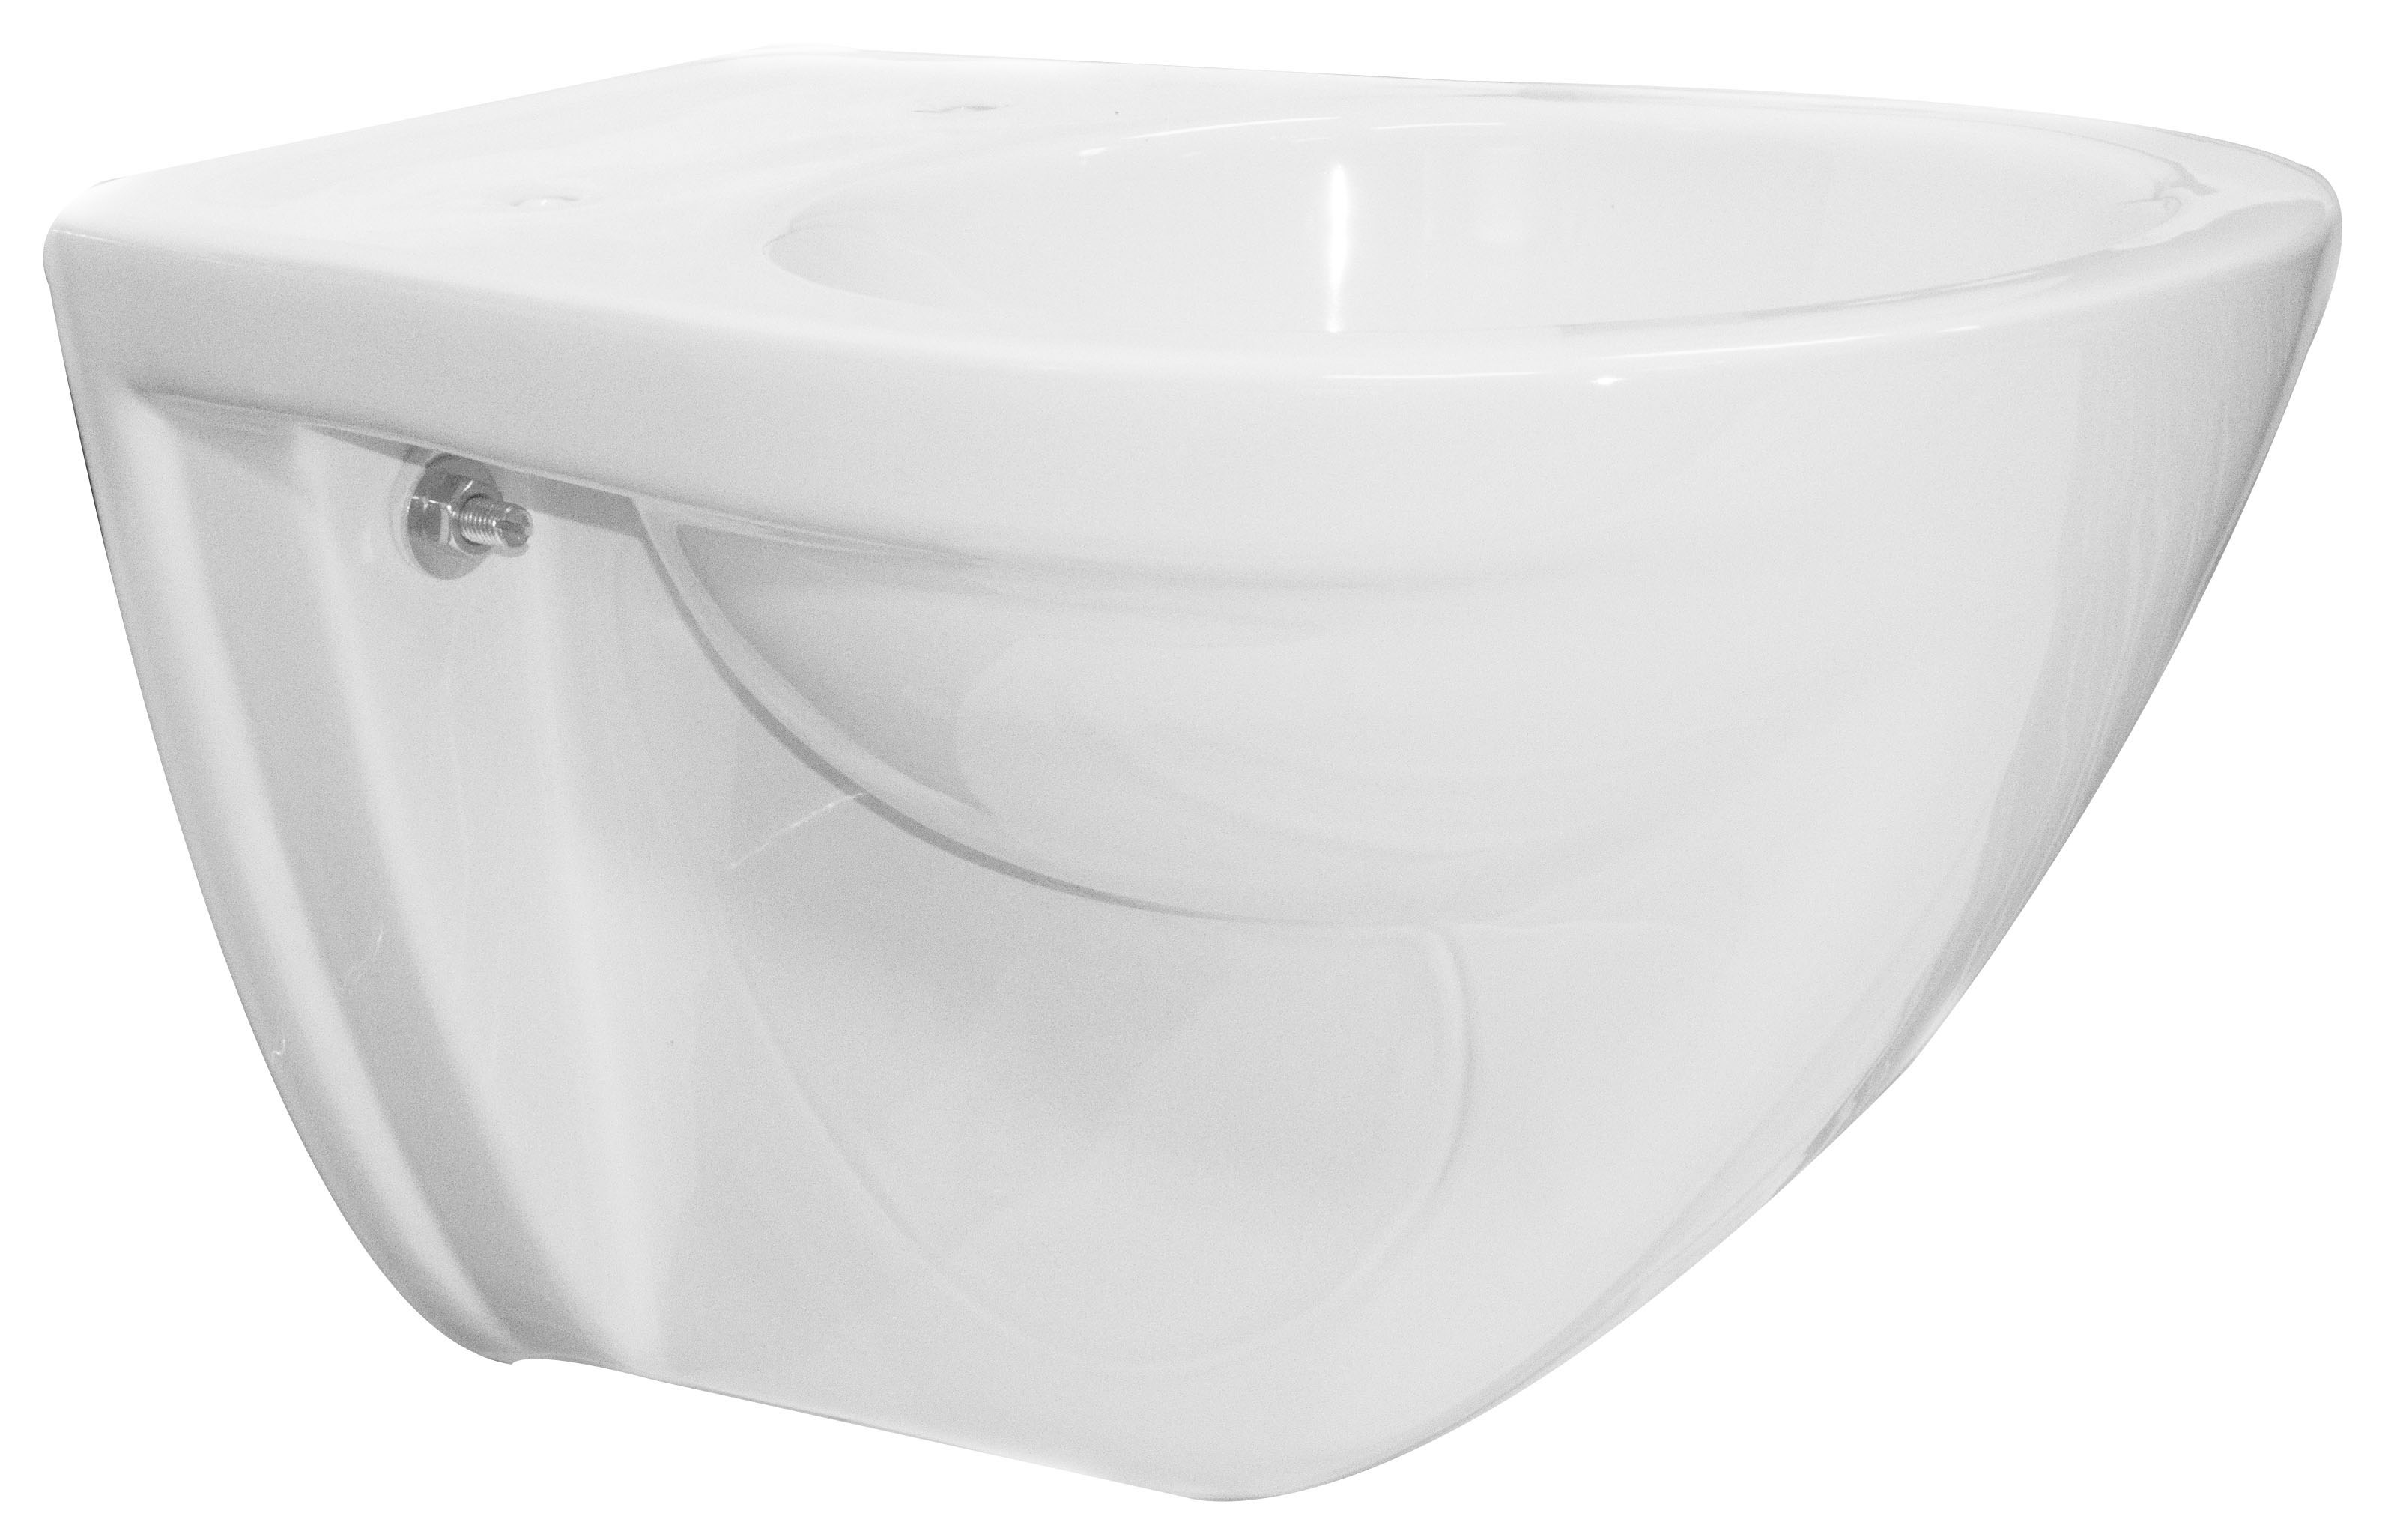 Vlakspoel Toilet Hangend : ▷ hangend toilet vlakspoel kopen online internetwinkel